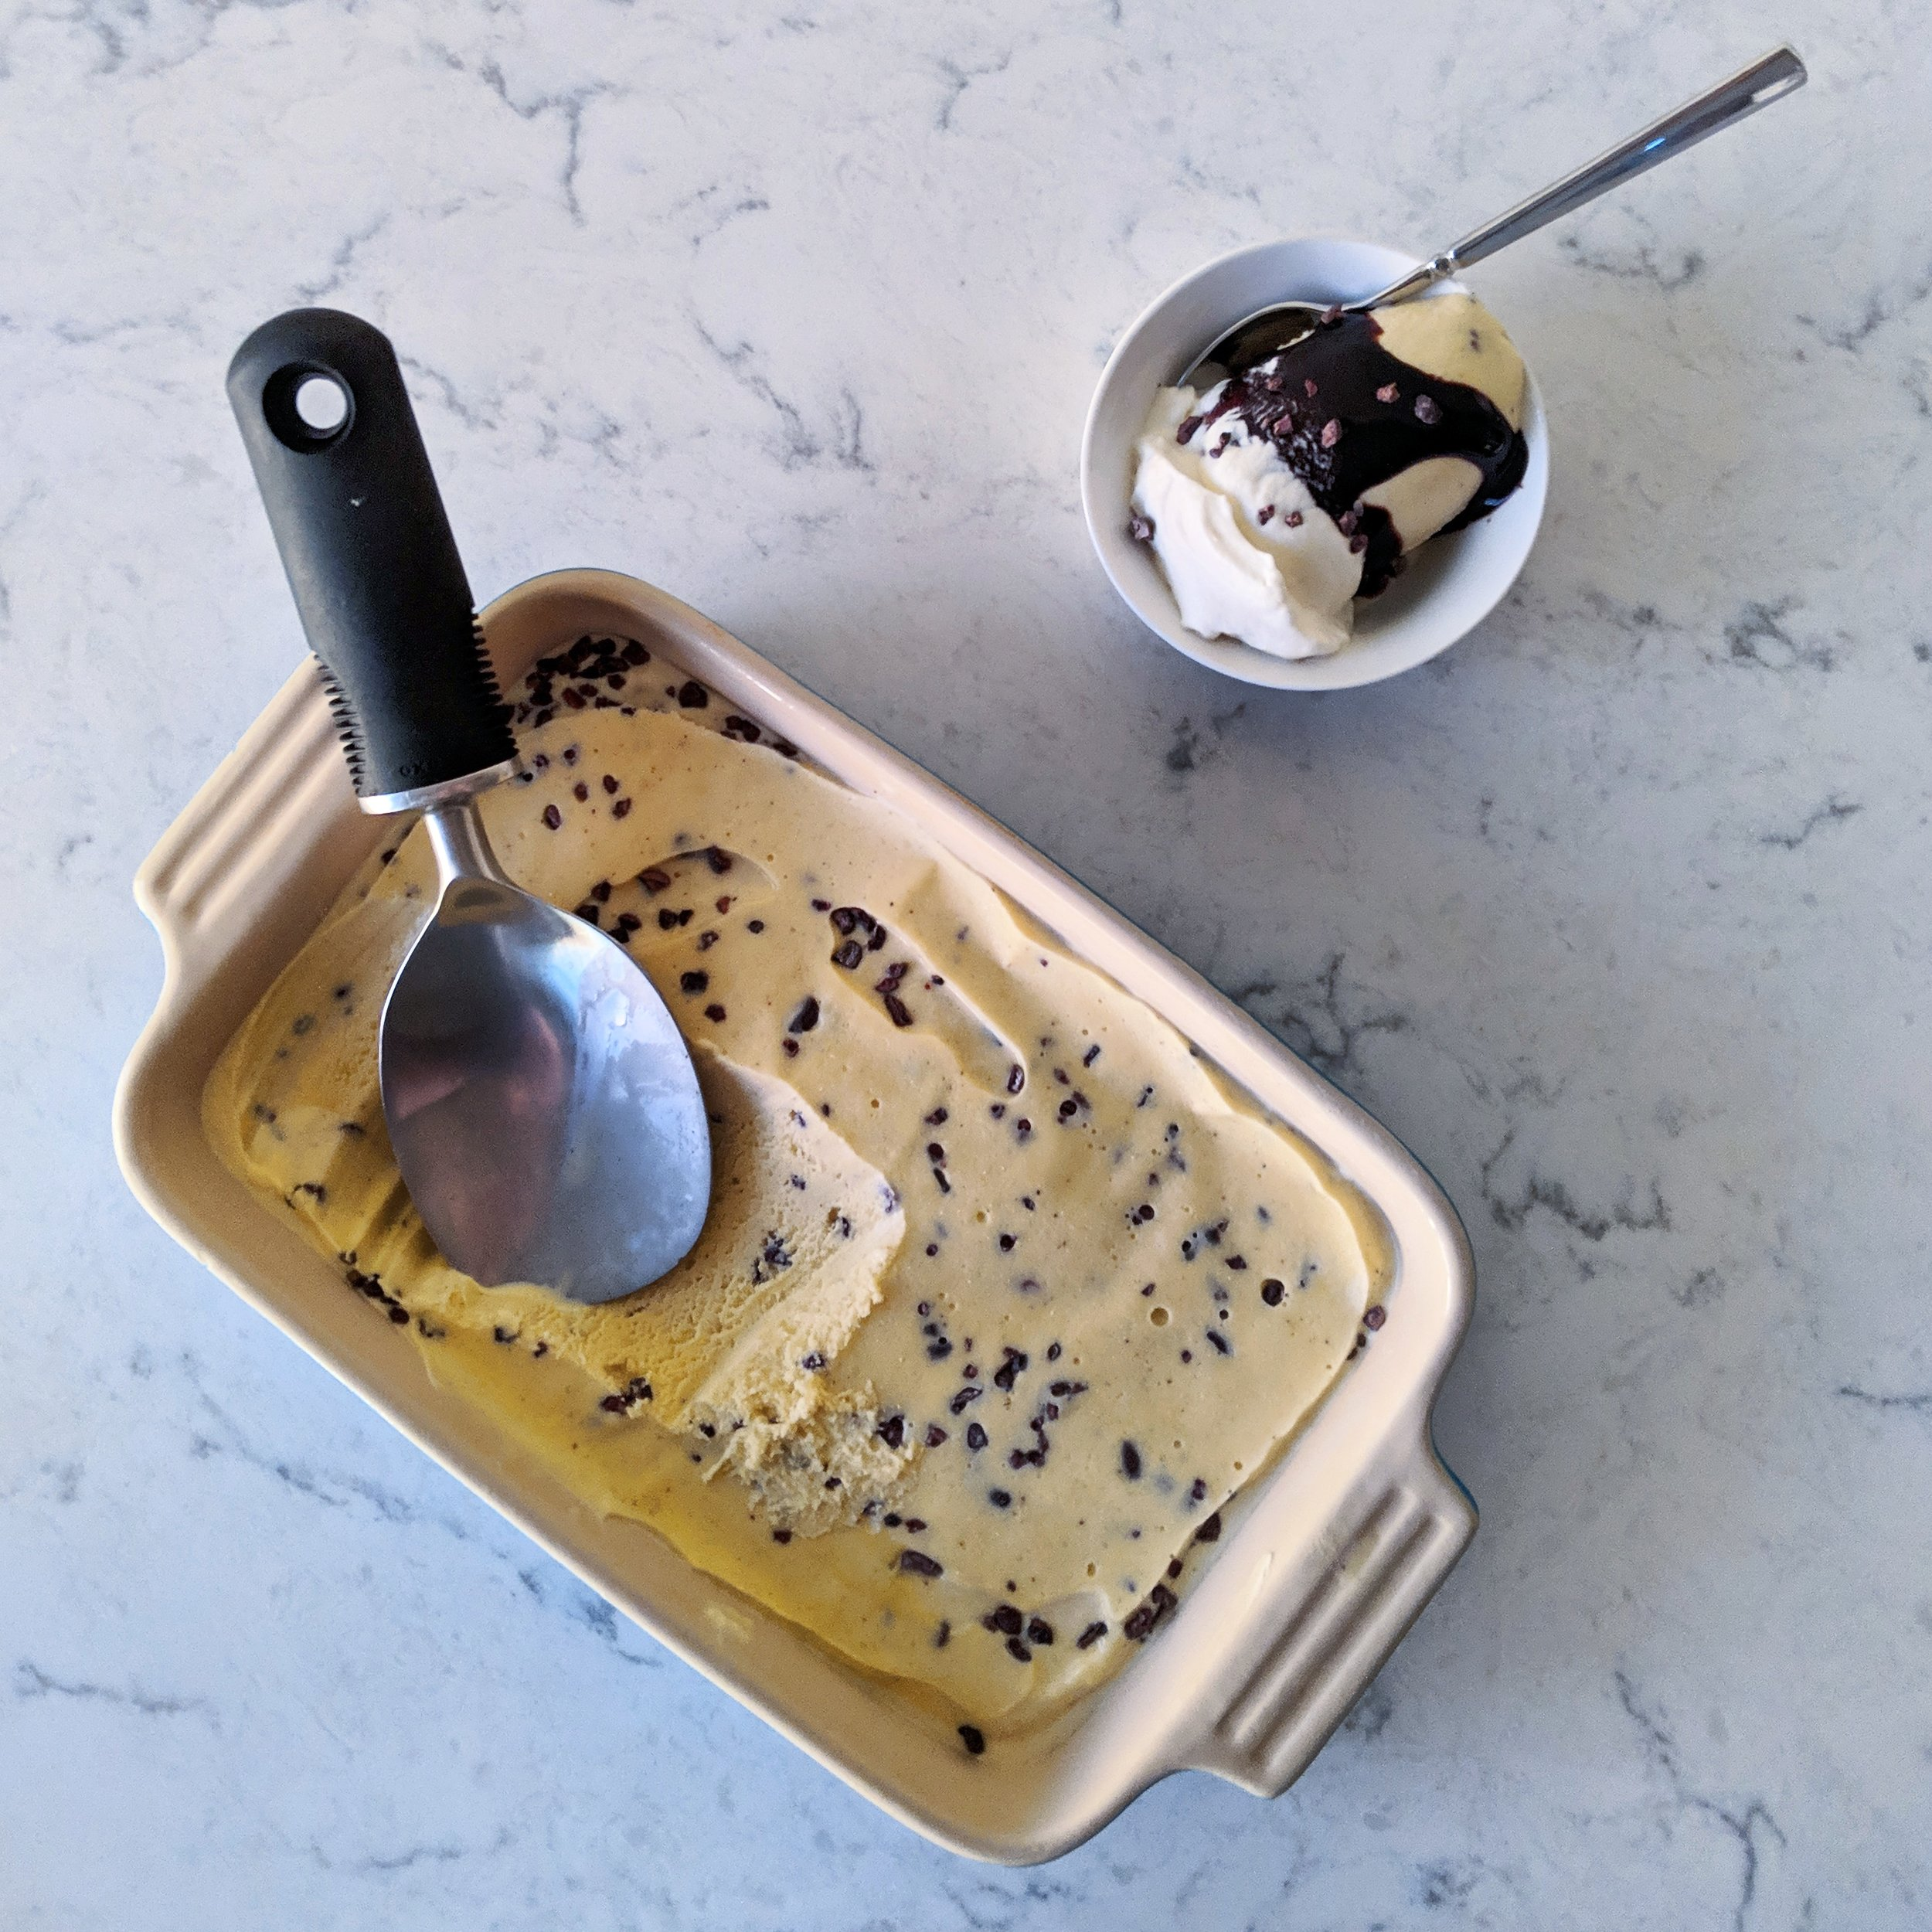 hot_fudge_sundae_with_cocoa_nib_ice_cream.jpg